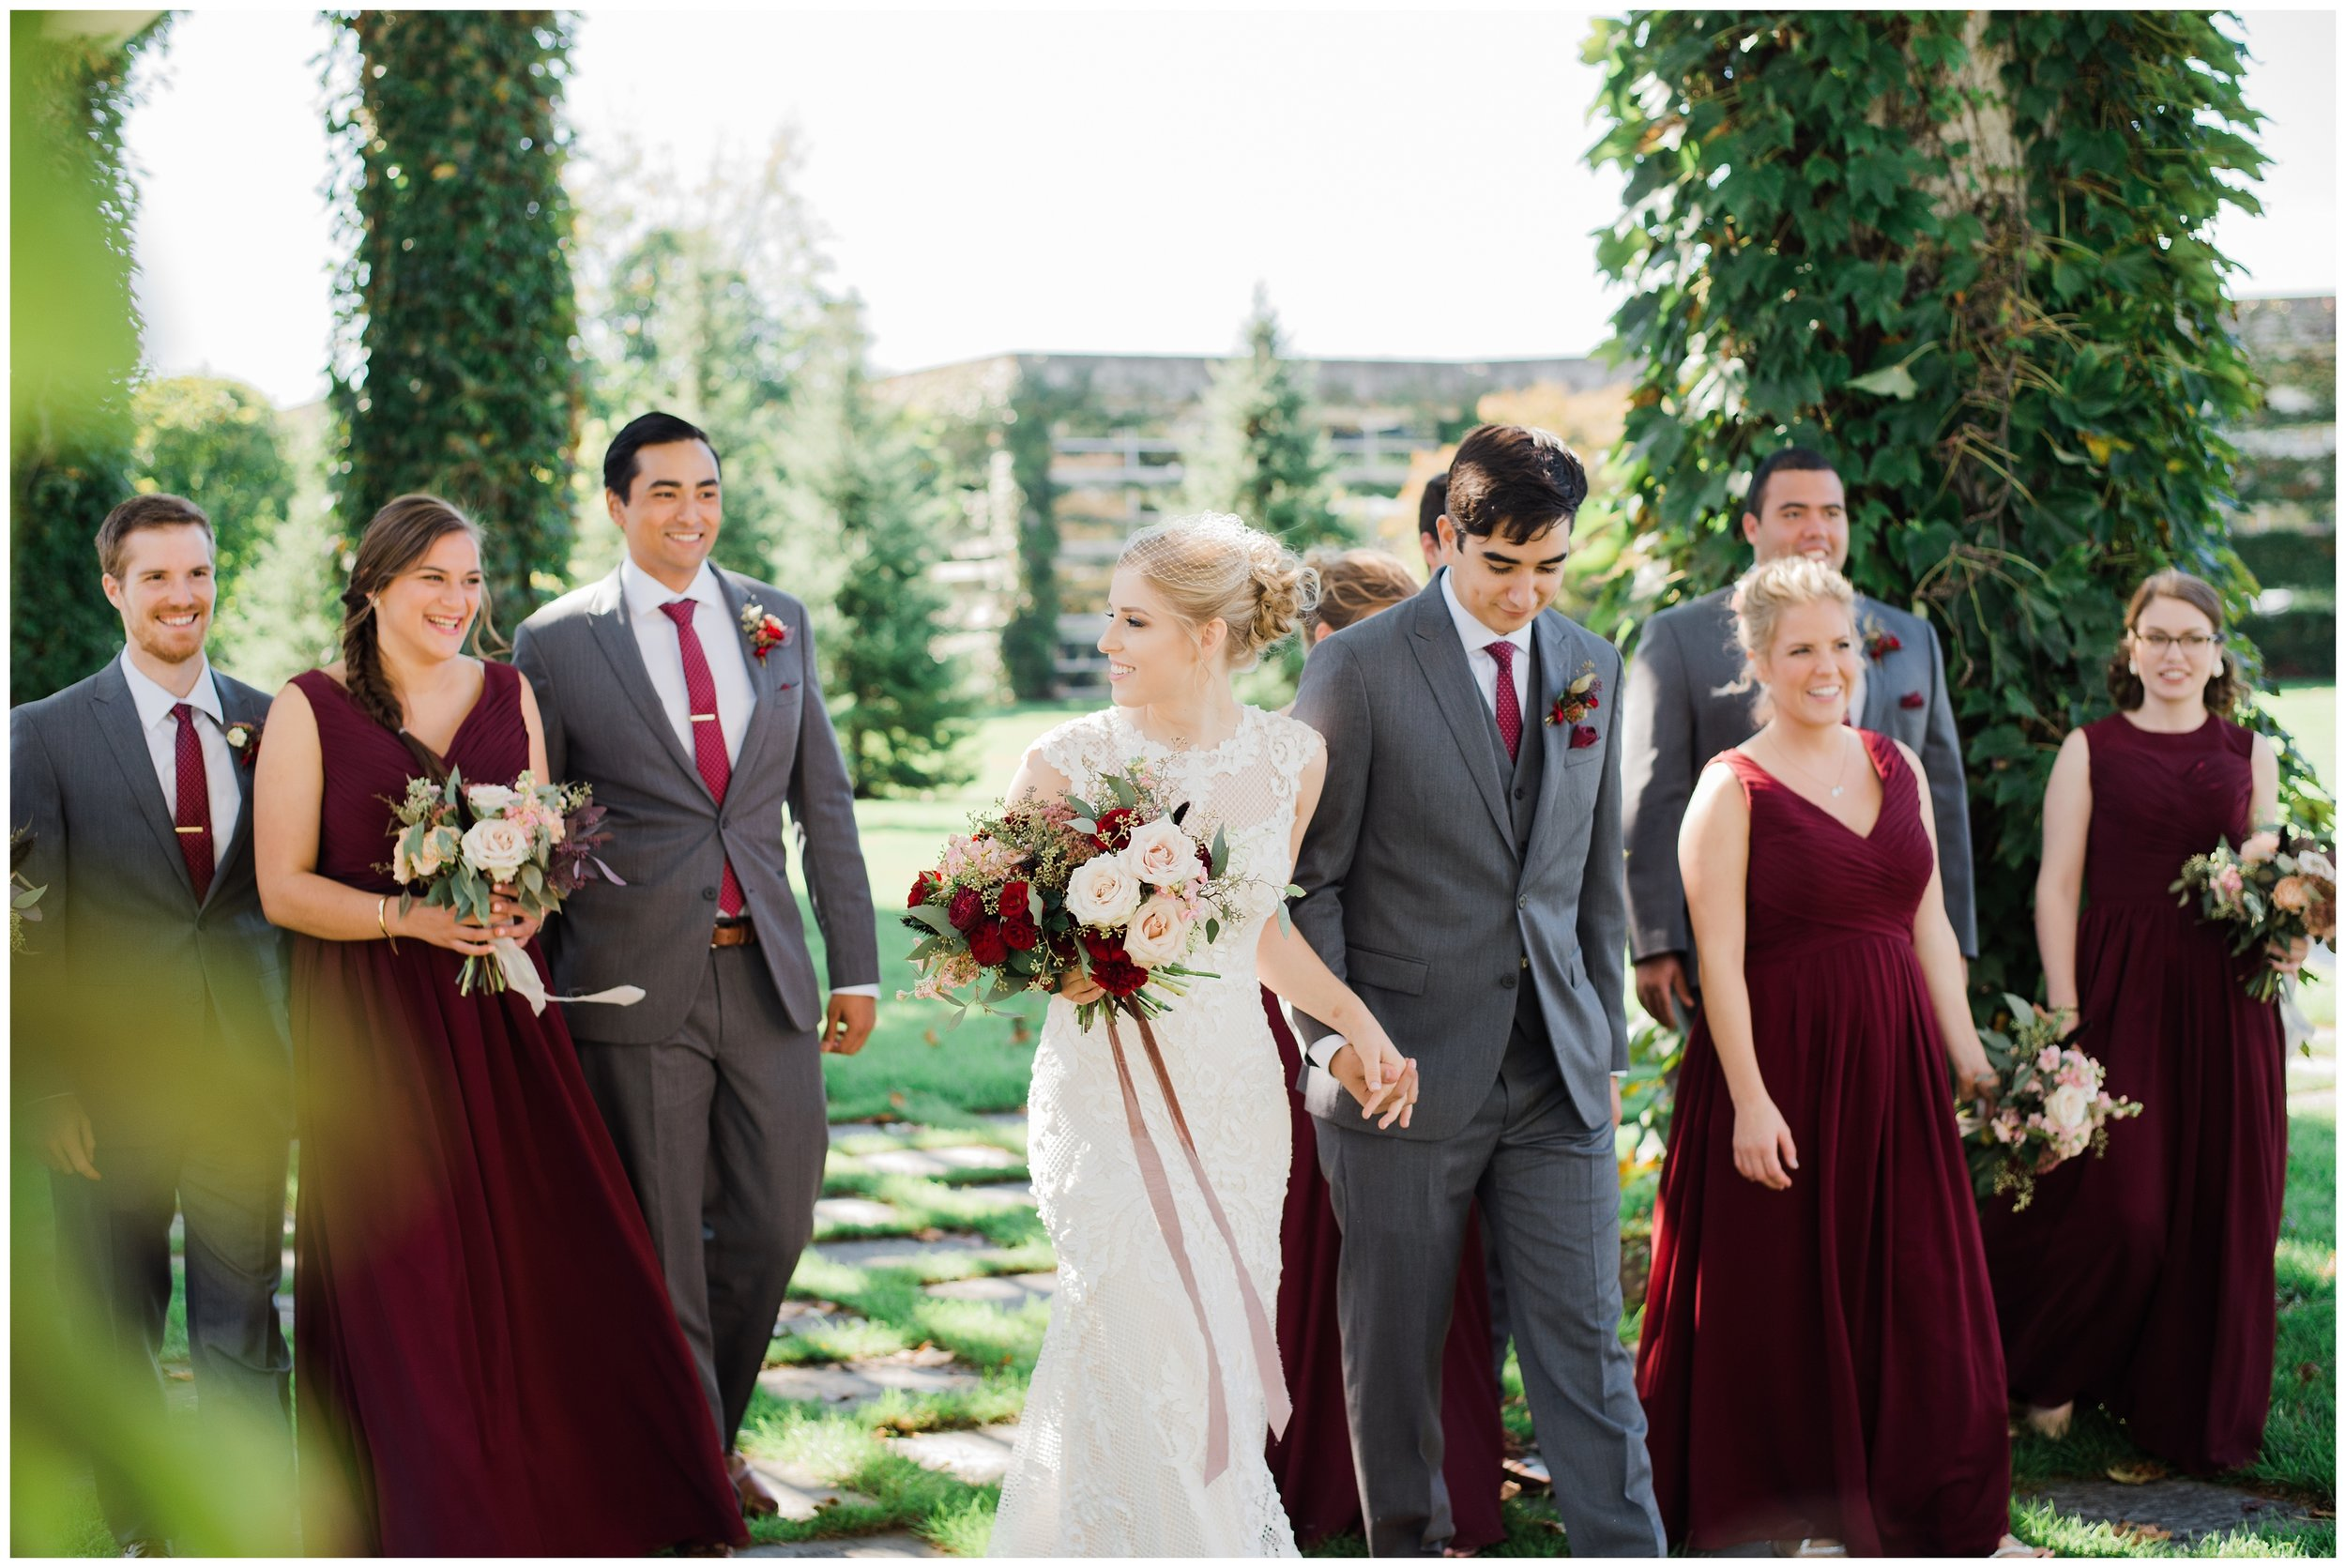 Rebecca_Shehorn_Photography_Indianapolis_Wedding_Photographer_7333.jpg